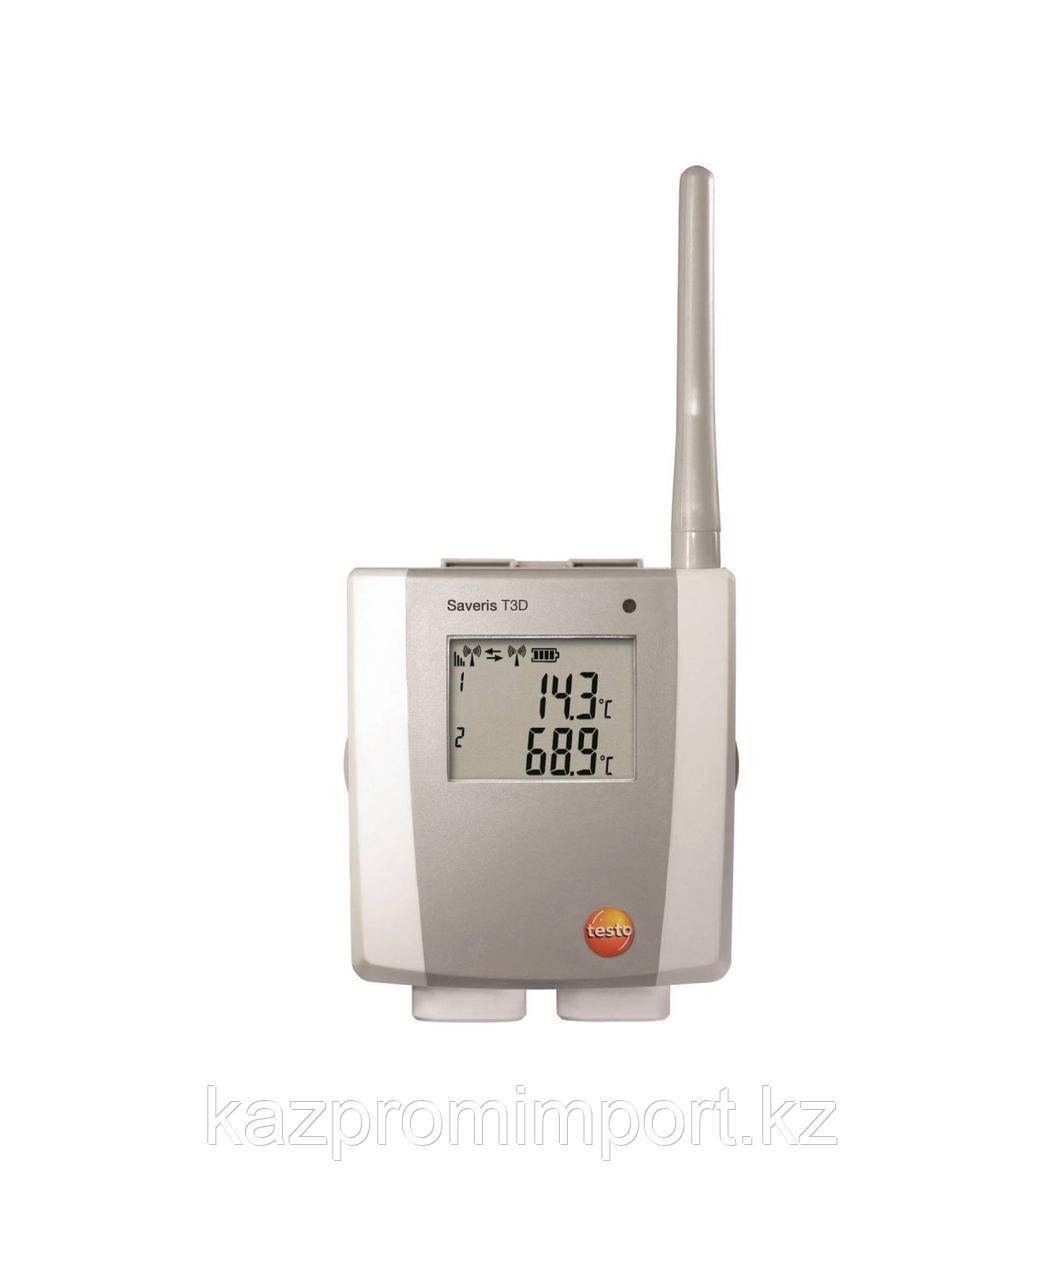 Testo Saveris T3 D - 2-х канальный радиозонд температуры, с дисплеем